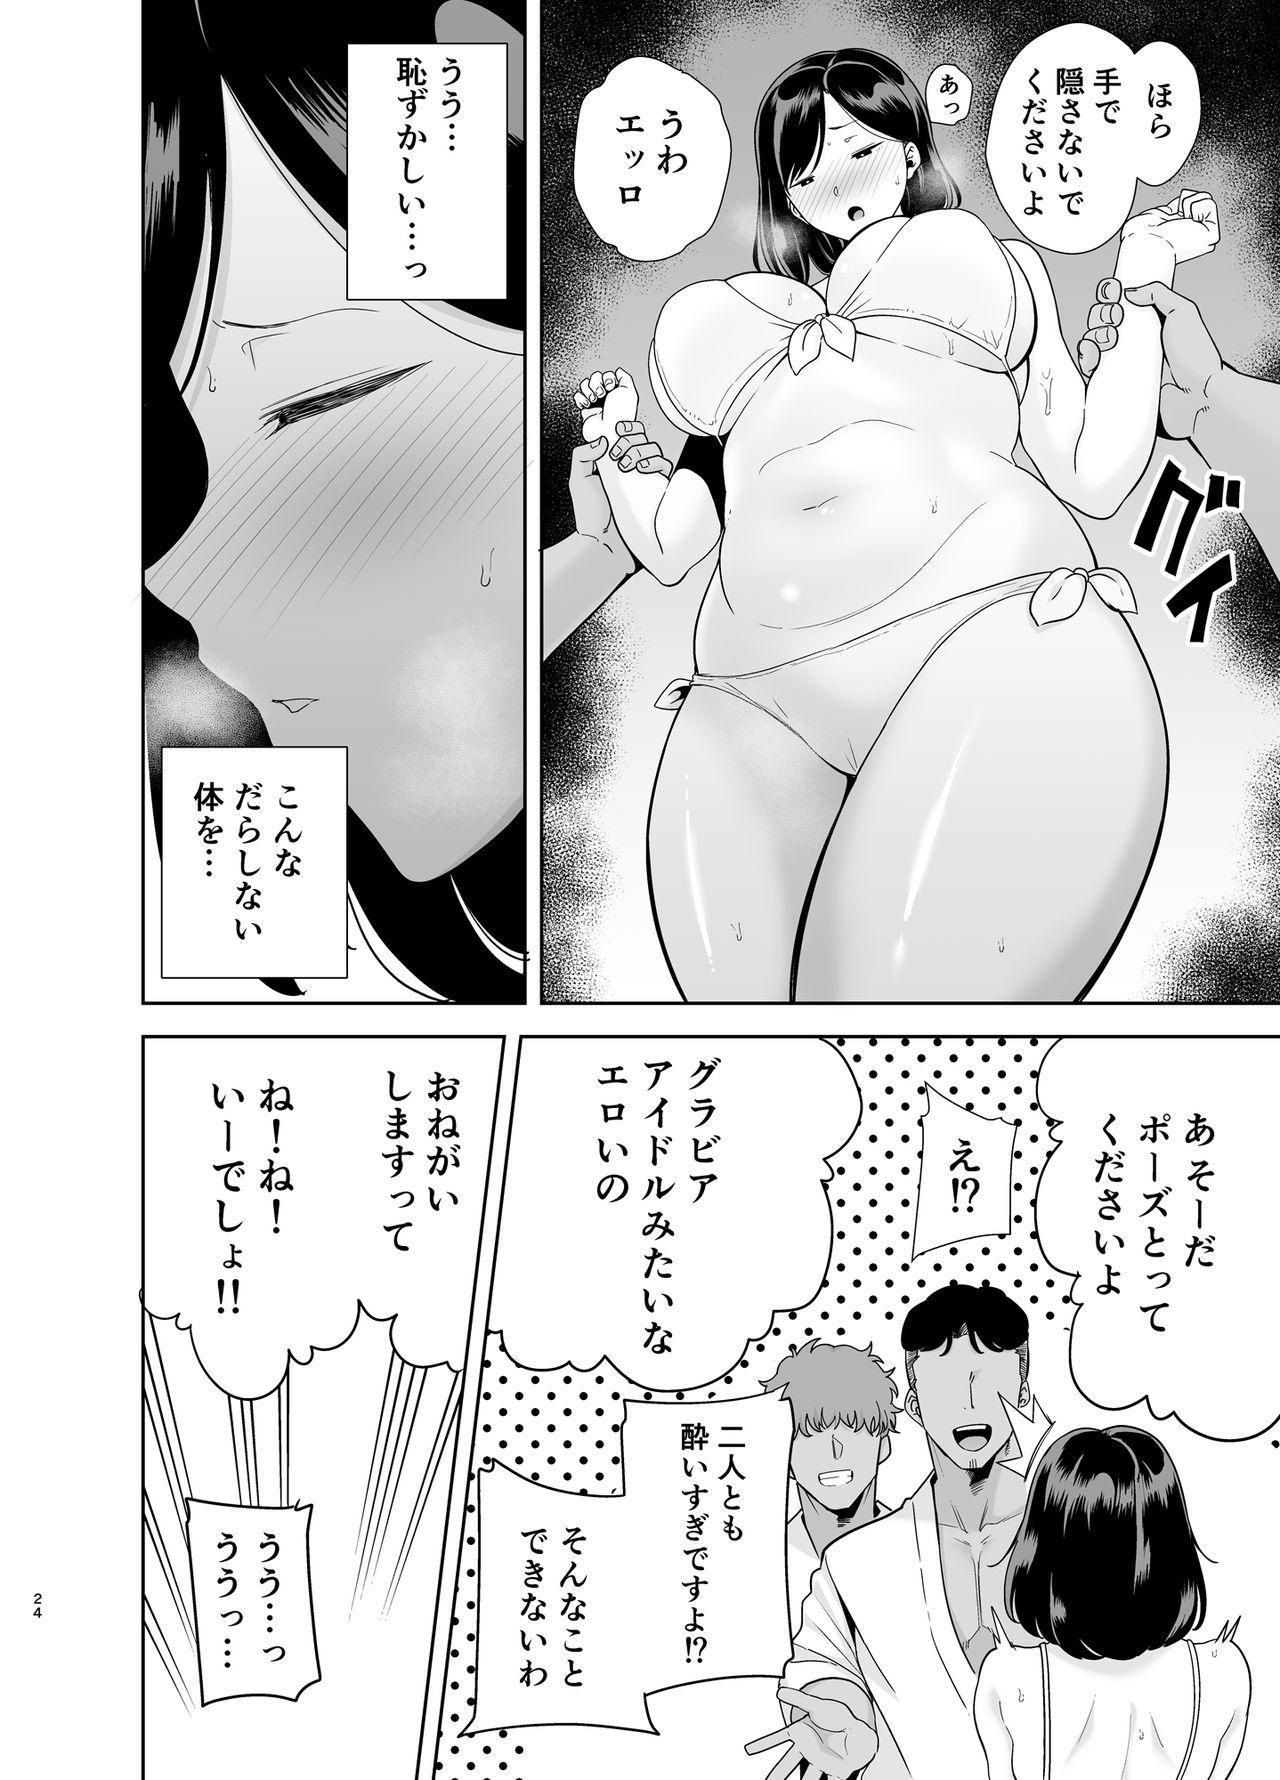 Natsuzuma 122